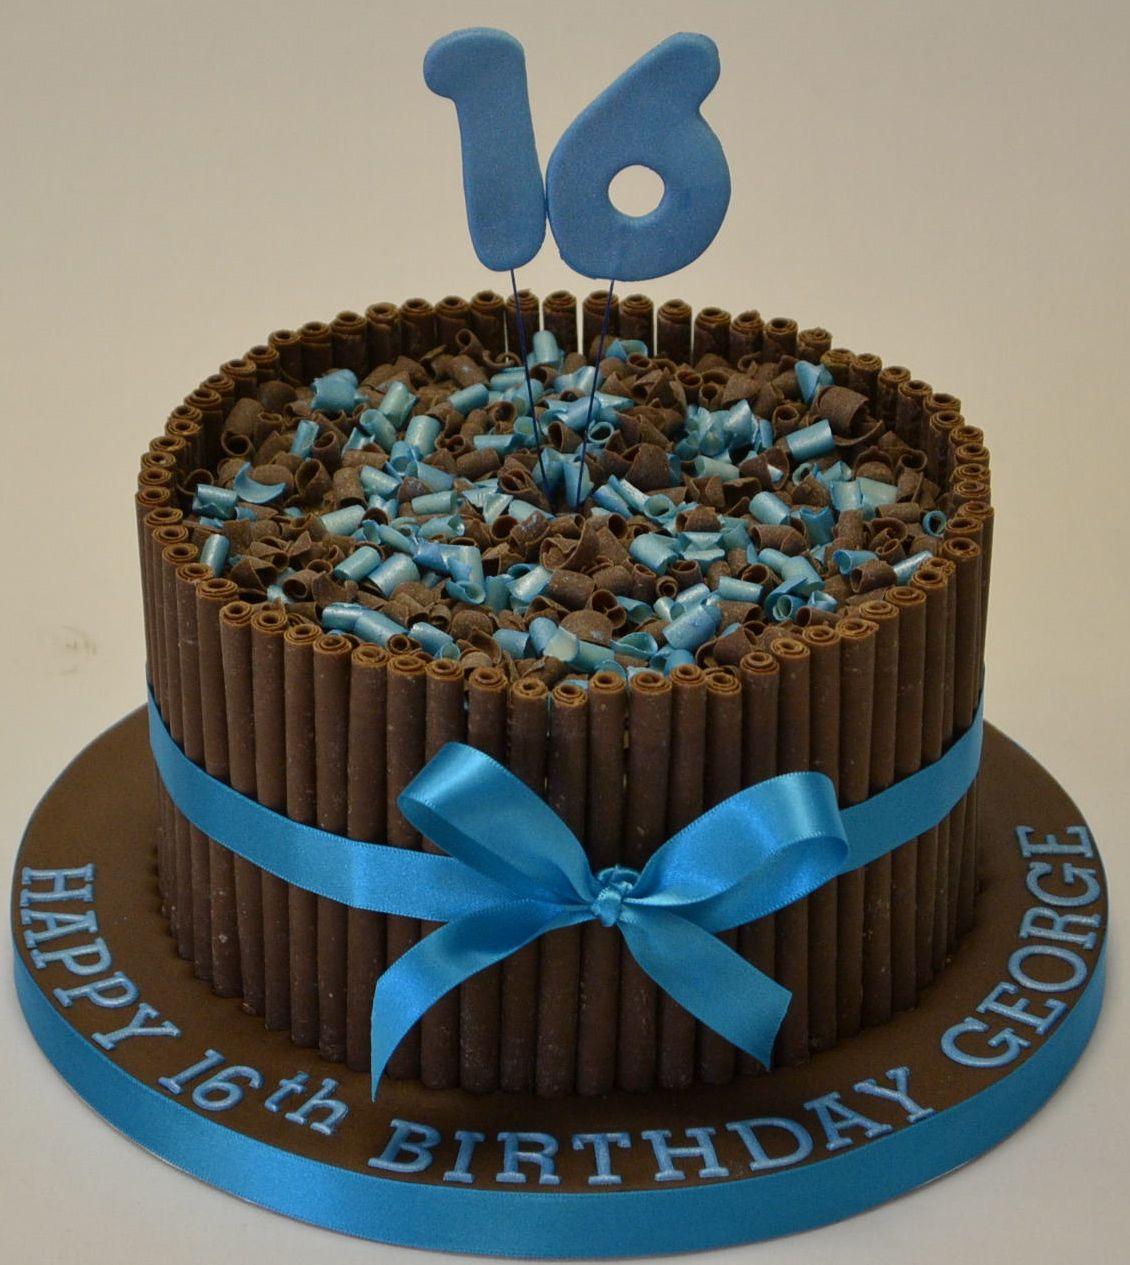 16th birthday cakes for boys 16th birthday cigarillo